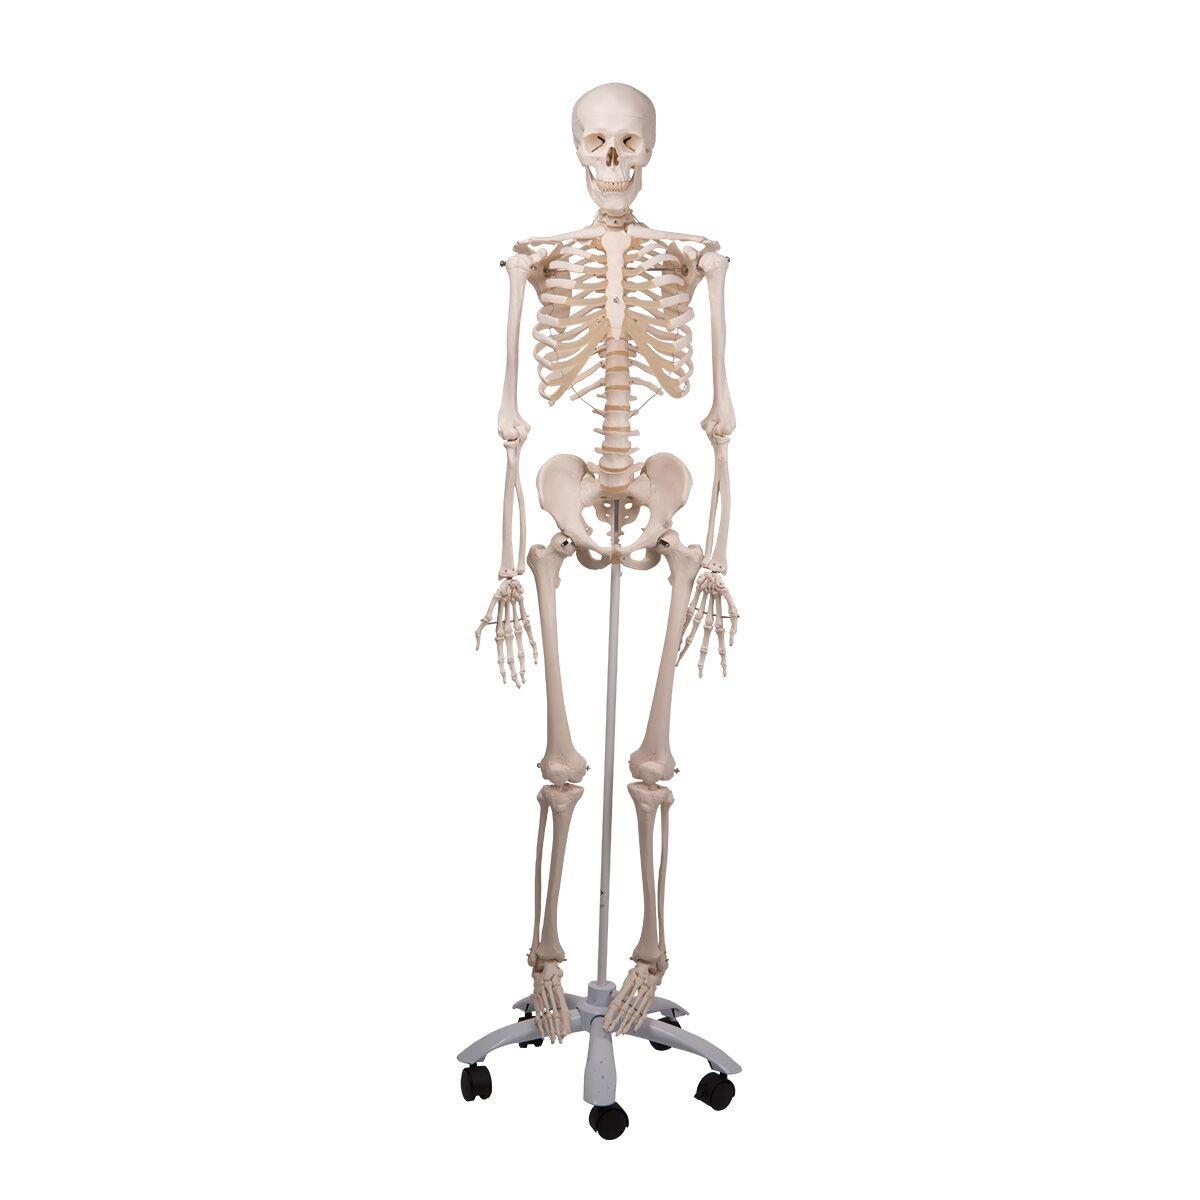 3b Human Skeleton Stan Skeletons Skeletal System Human